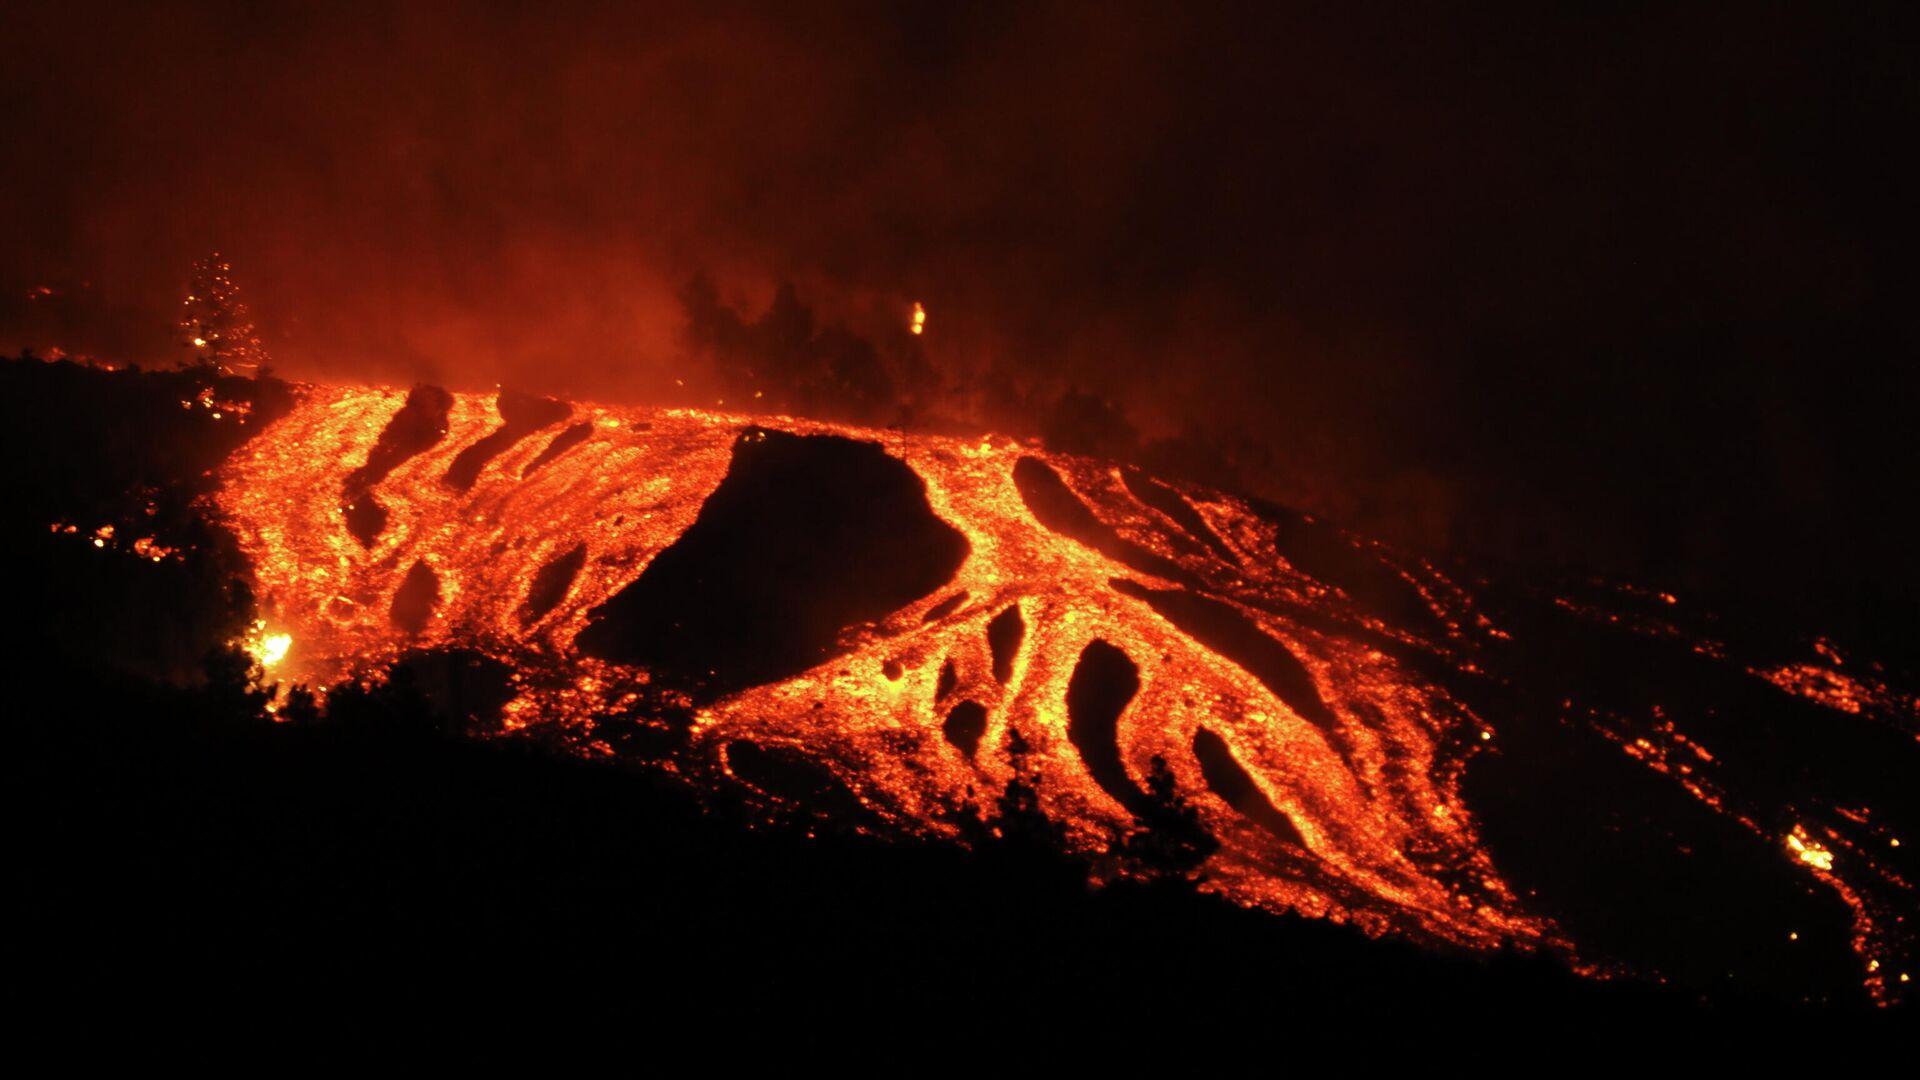 Erupción del volcán de Cumbre Vieja en La Palma - Sputnik Mundo, 1920, 20.09.2021